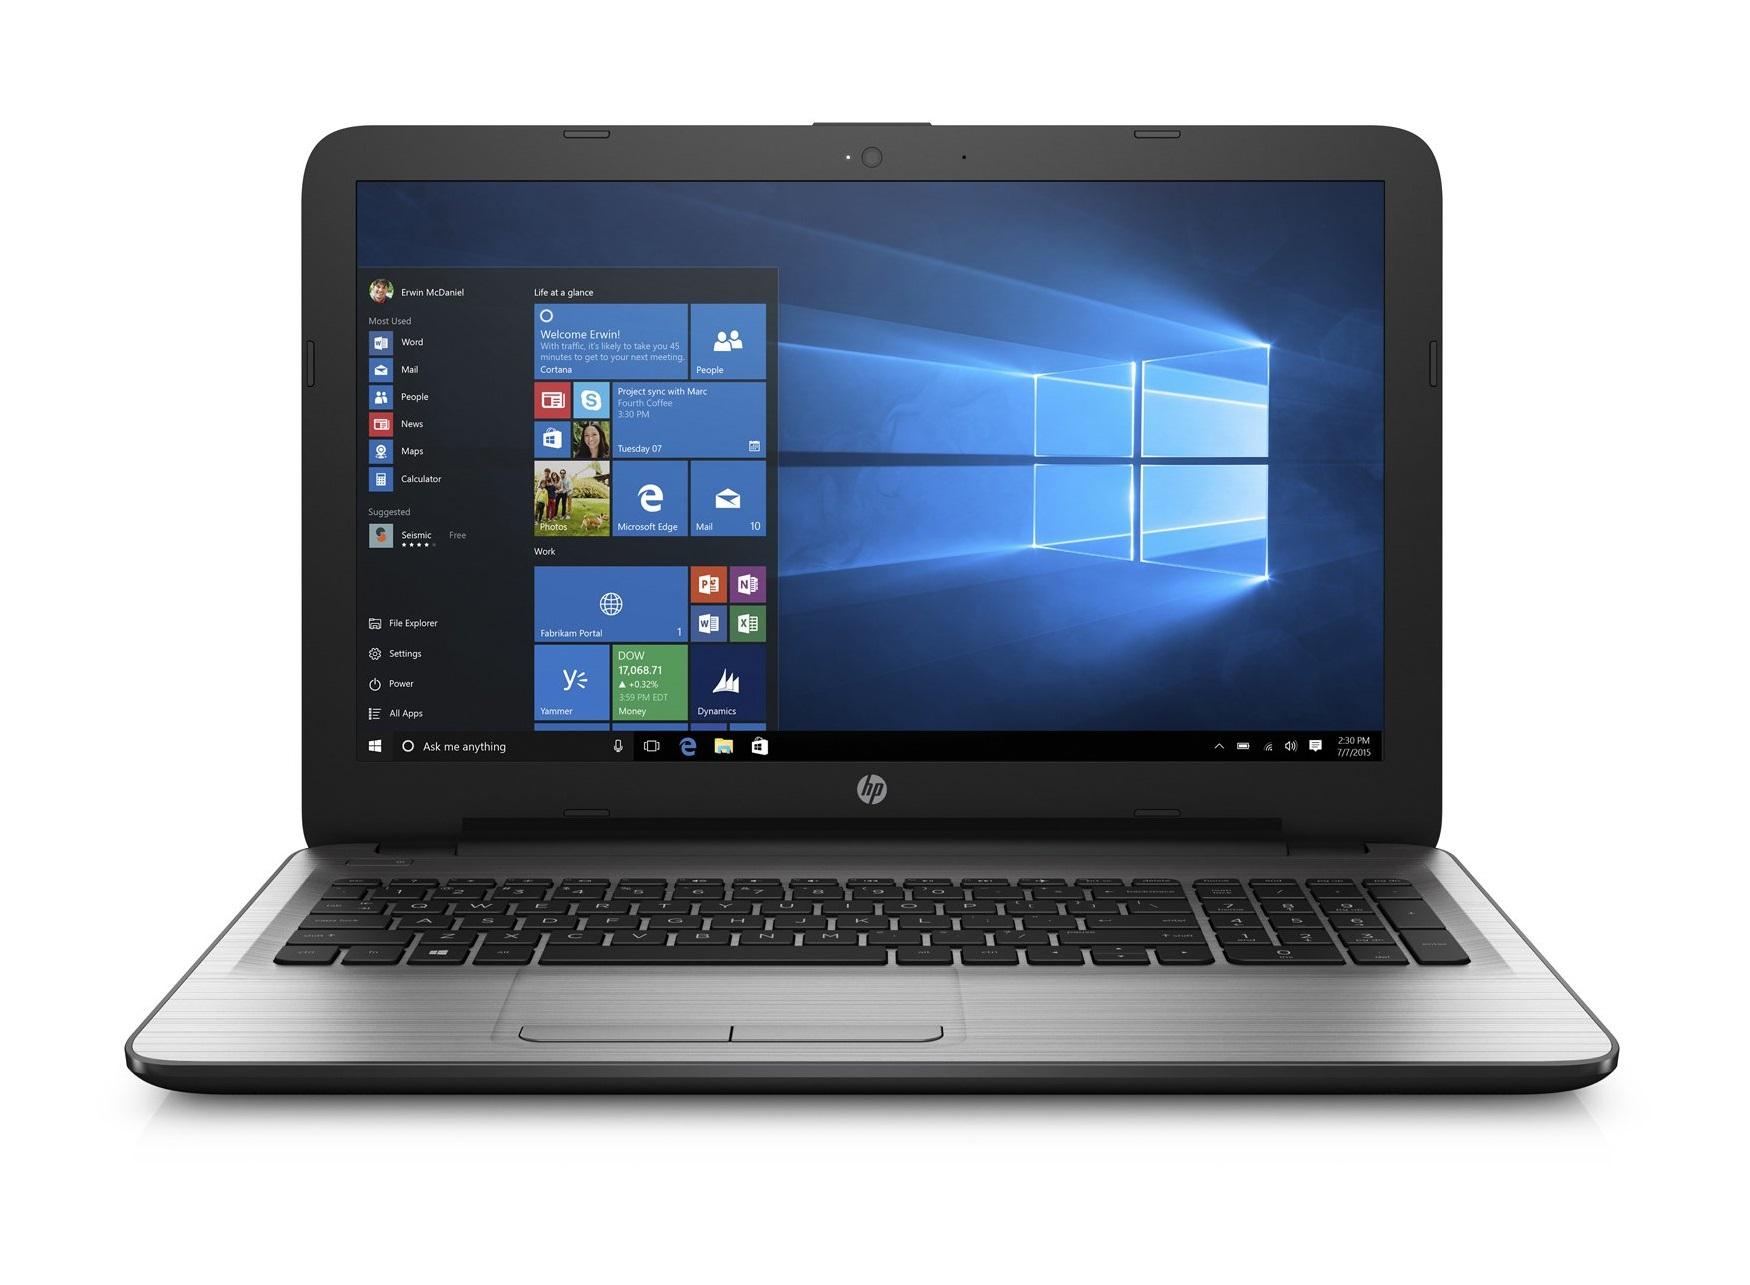 HP 250 G5 SP Intel Core i3-5005U 39,6cm 15,6Zoll FHD AG UMA 1x4GB 500GB/HDD DVDRW WLAN BT W7PRO64+W10PRO64 2J. Gar. (DE)